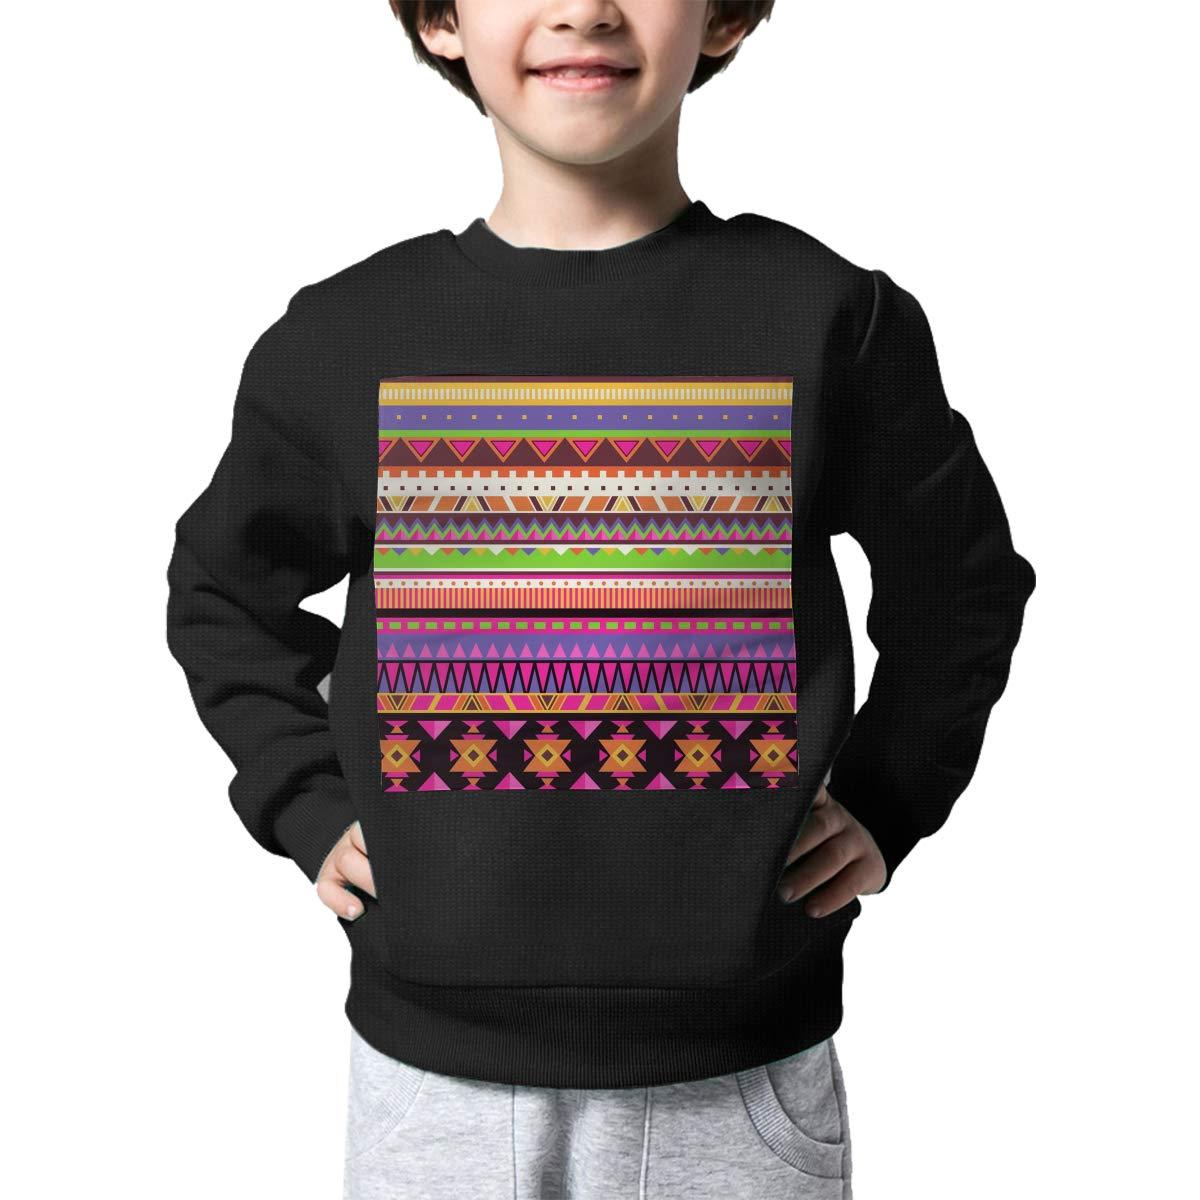 NJKM5MJ Boys Girls Nation Geometric Pattern Lovely Sweaters Soft Warm Childrens Sweater